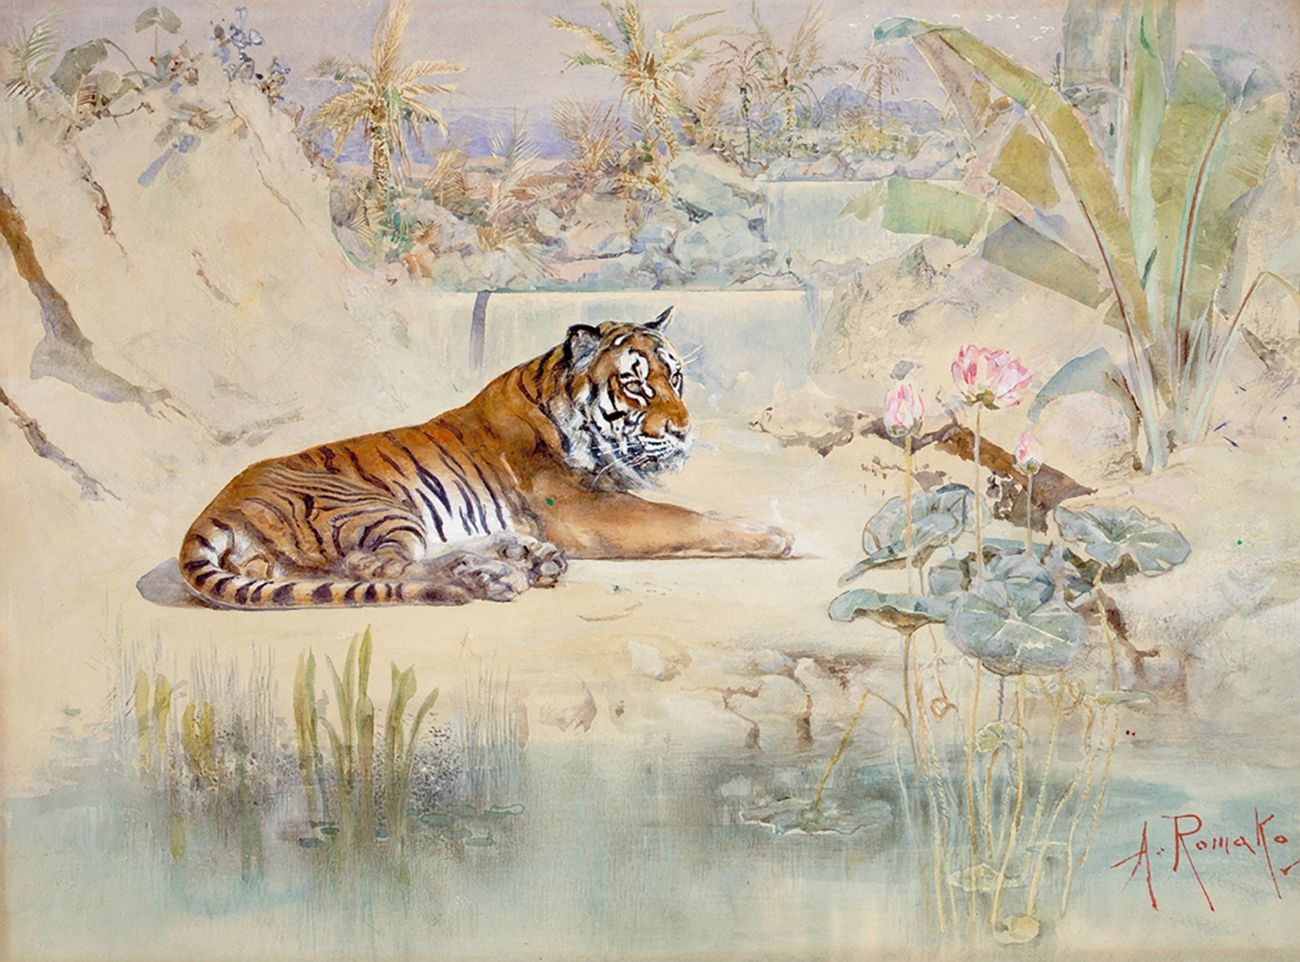 Anton Romako, Tigre, 1870. Albertina Museum, Vienna